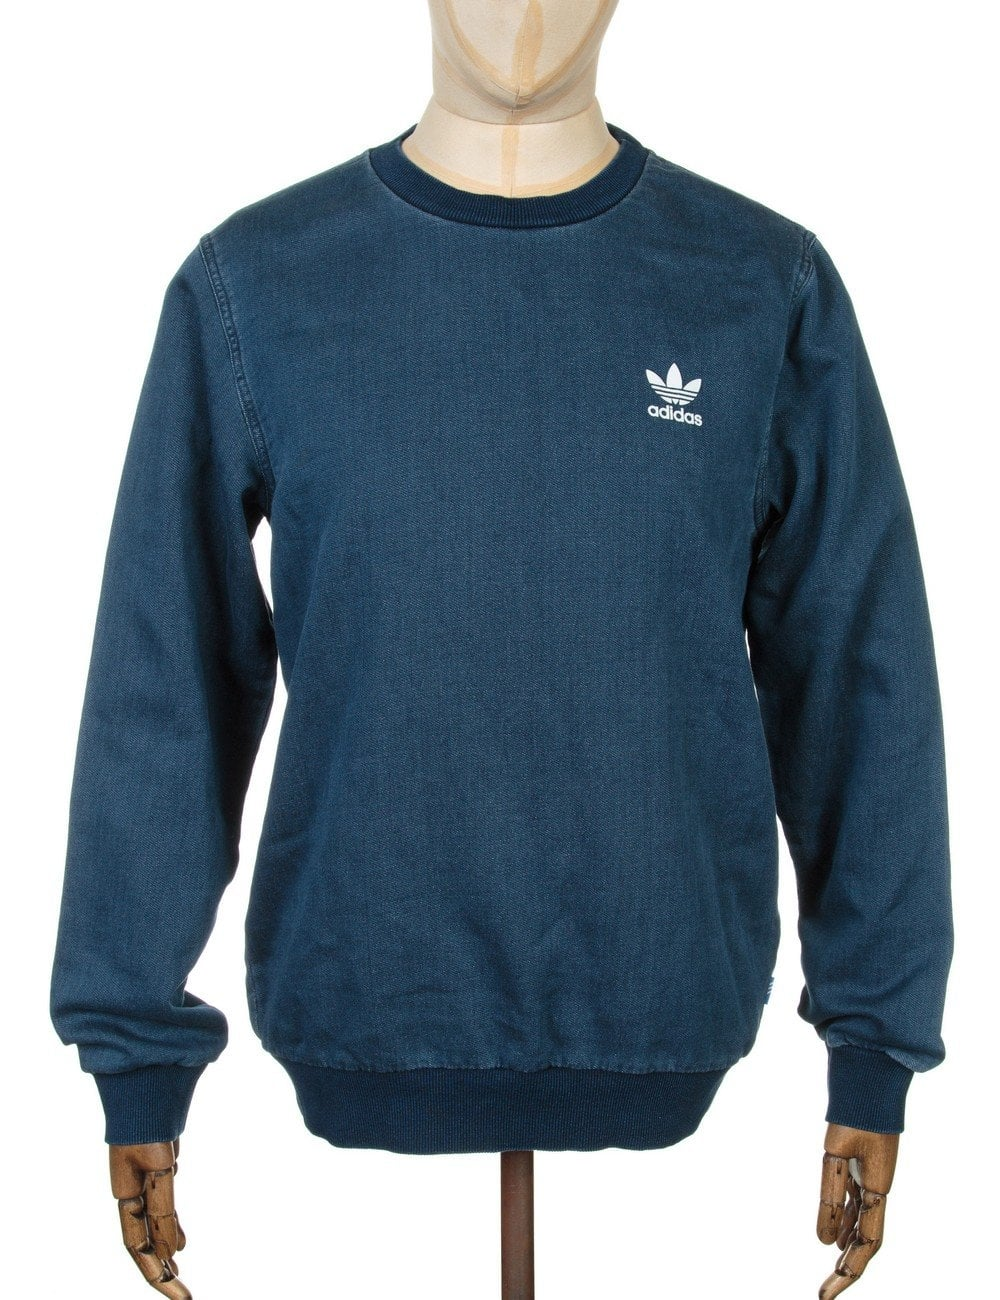 Sweatshirt Medium Sweatshirt Blue Denim Blue Denim Denim Sweatshirt Medium SMVUzp